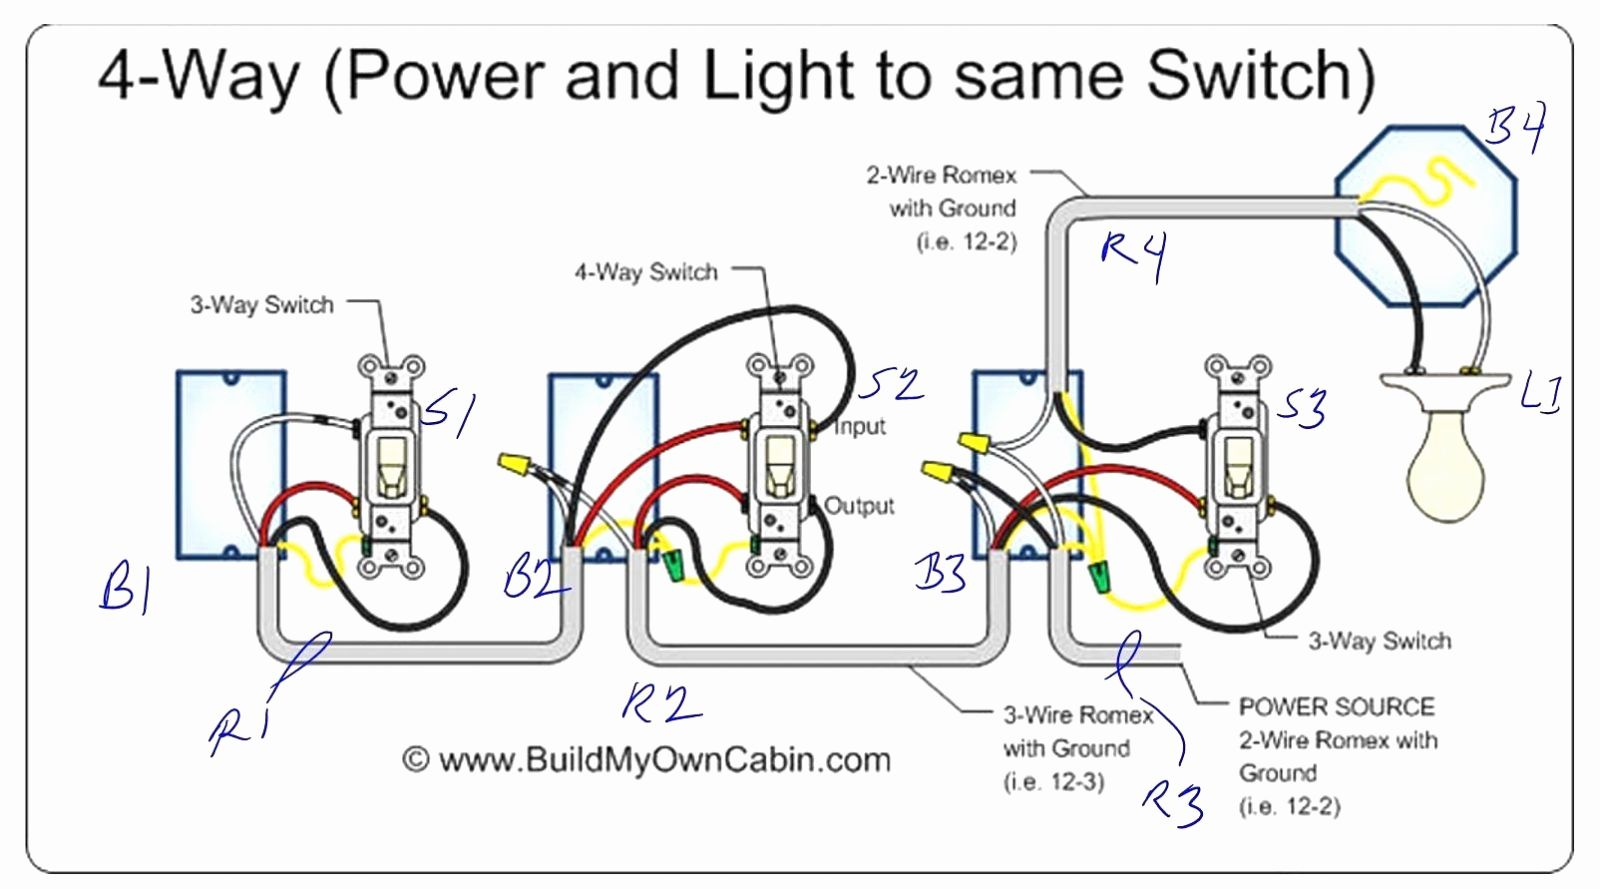 Lutron Dimmer 3 Way Switch Wiring Diagram Power Onward | Wiring Diagram - Lutron Dimmer Wiring Diagram